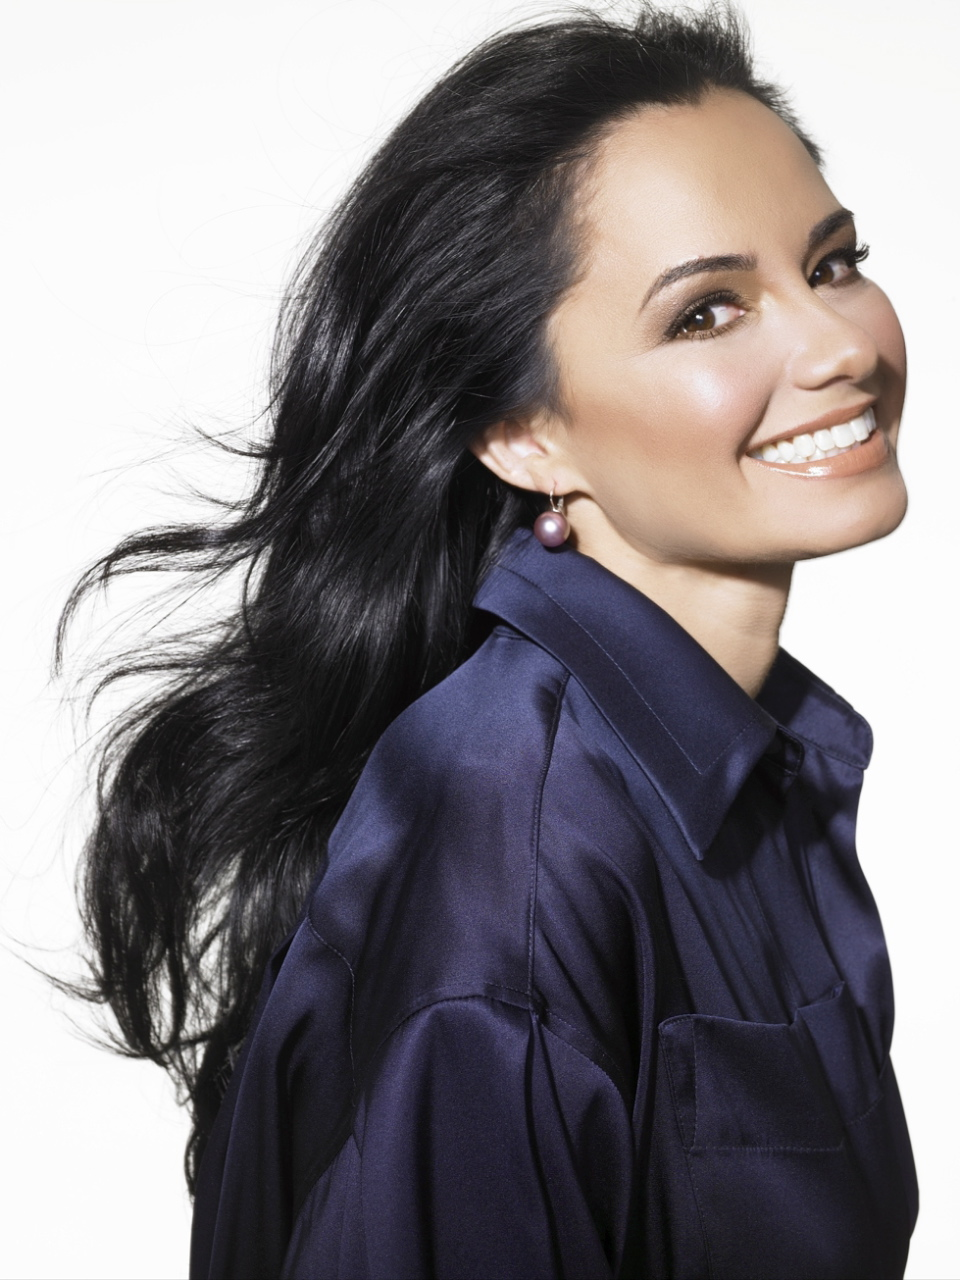 Skinterrogation: Dr. Lisa Airan